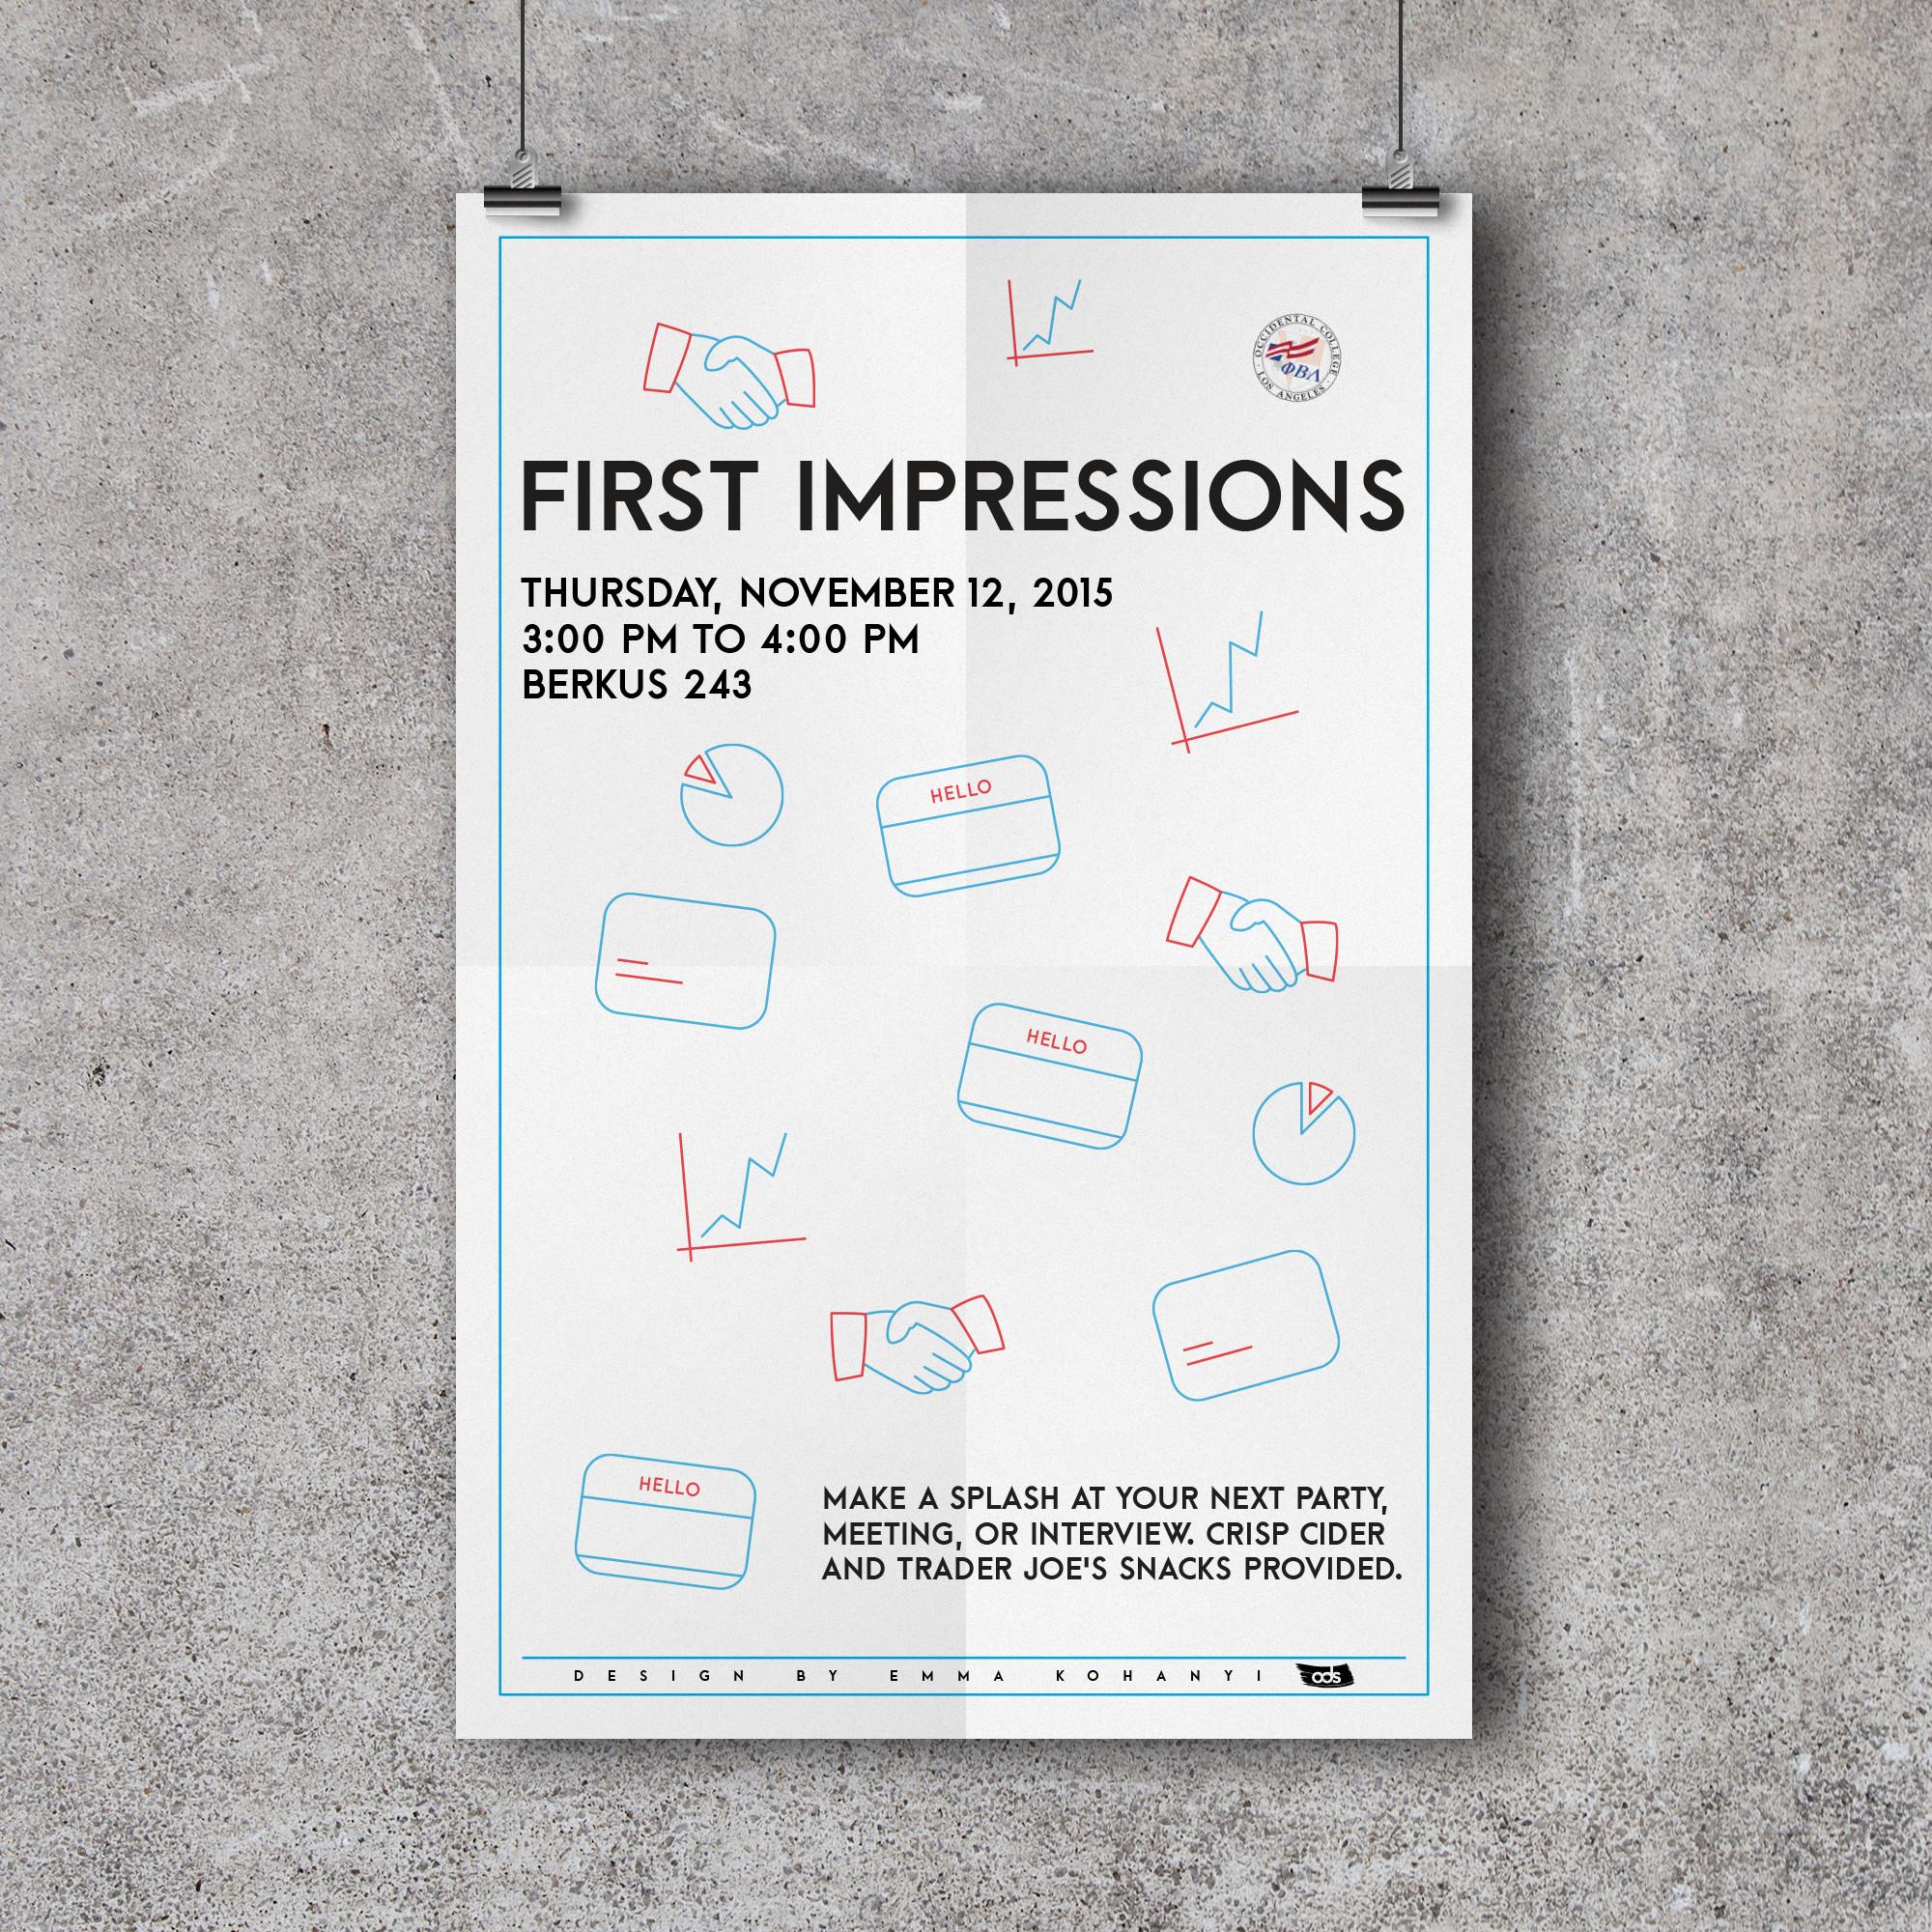 poster_mockup_v1.0_timeasley.com.jpg